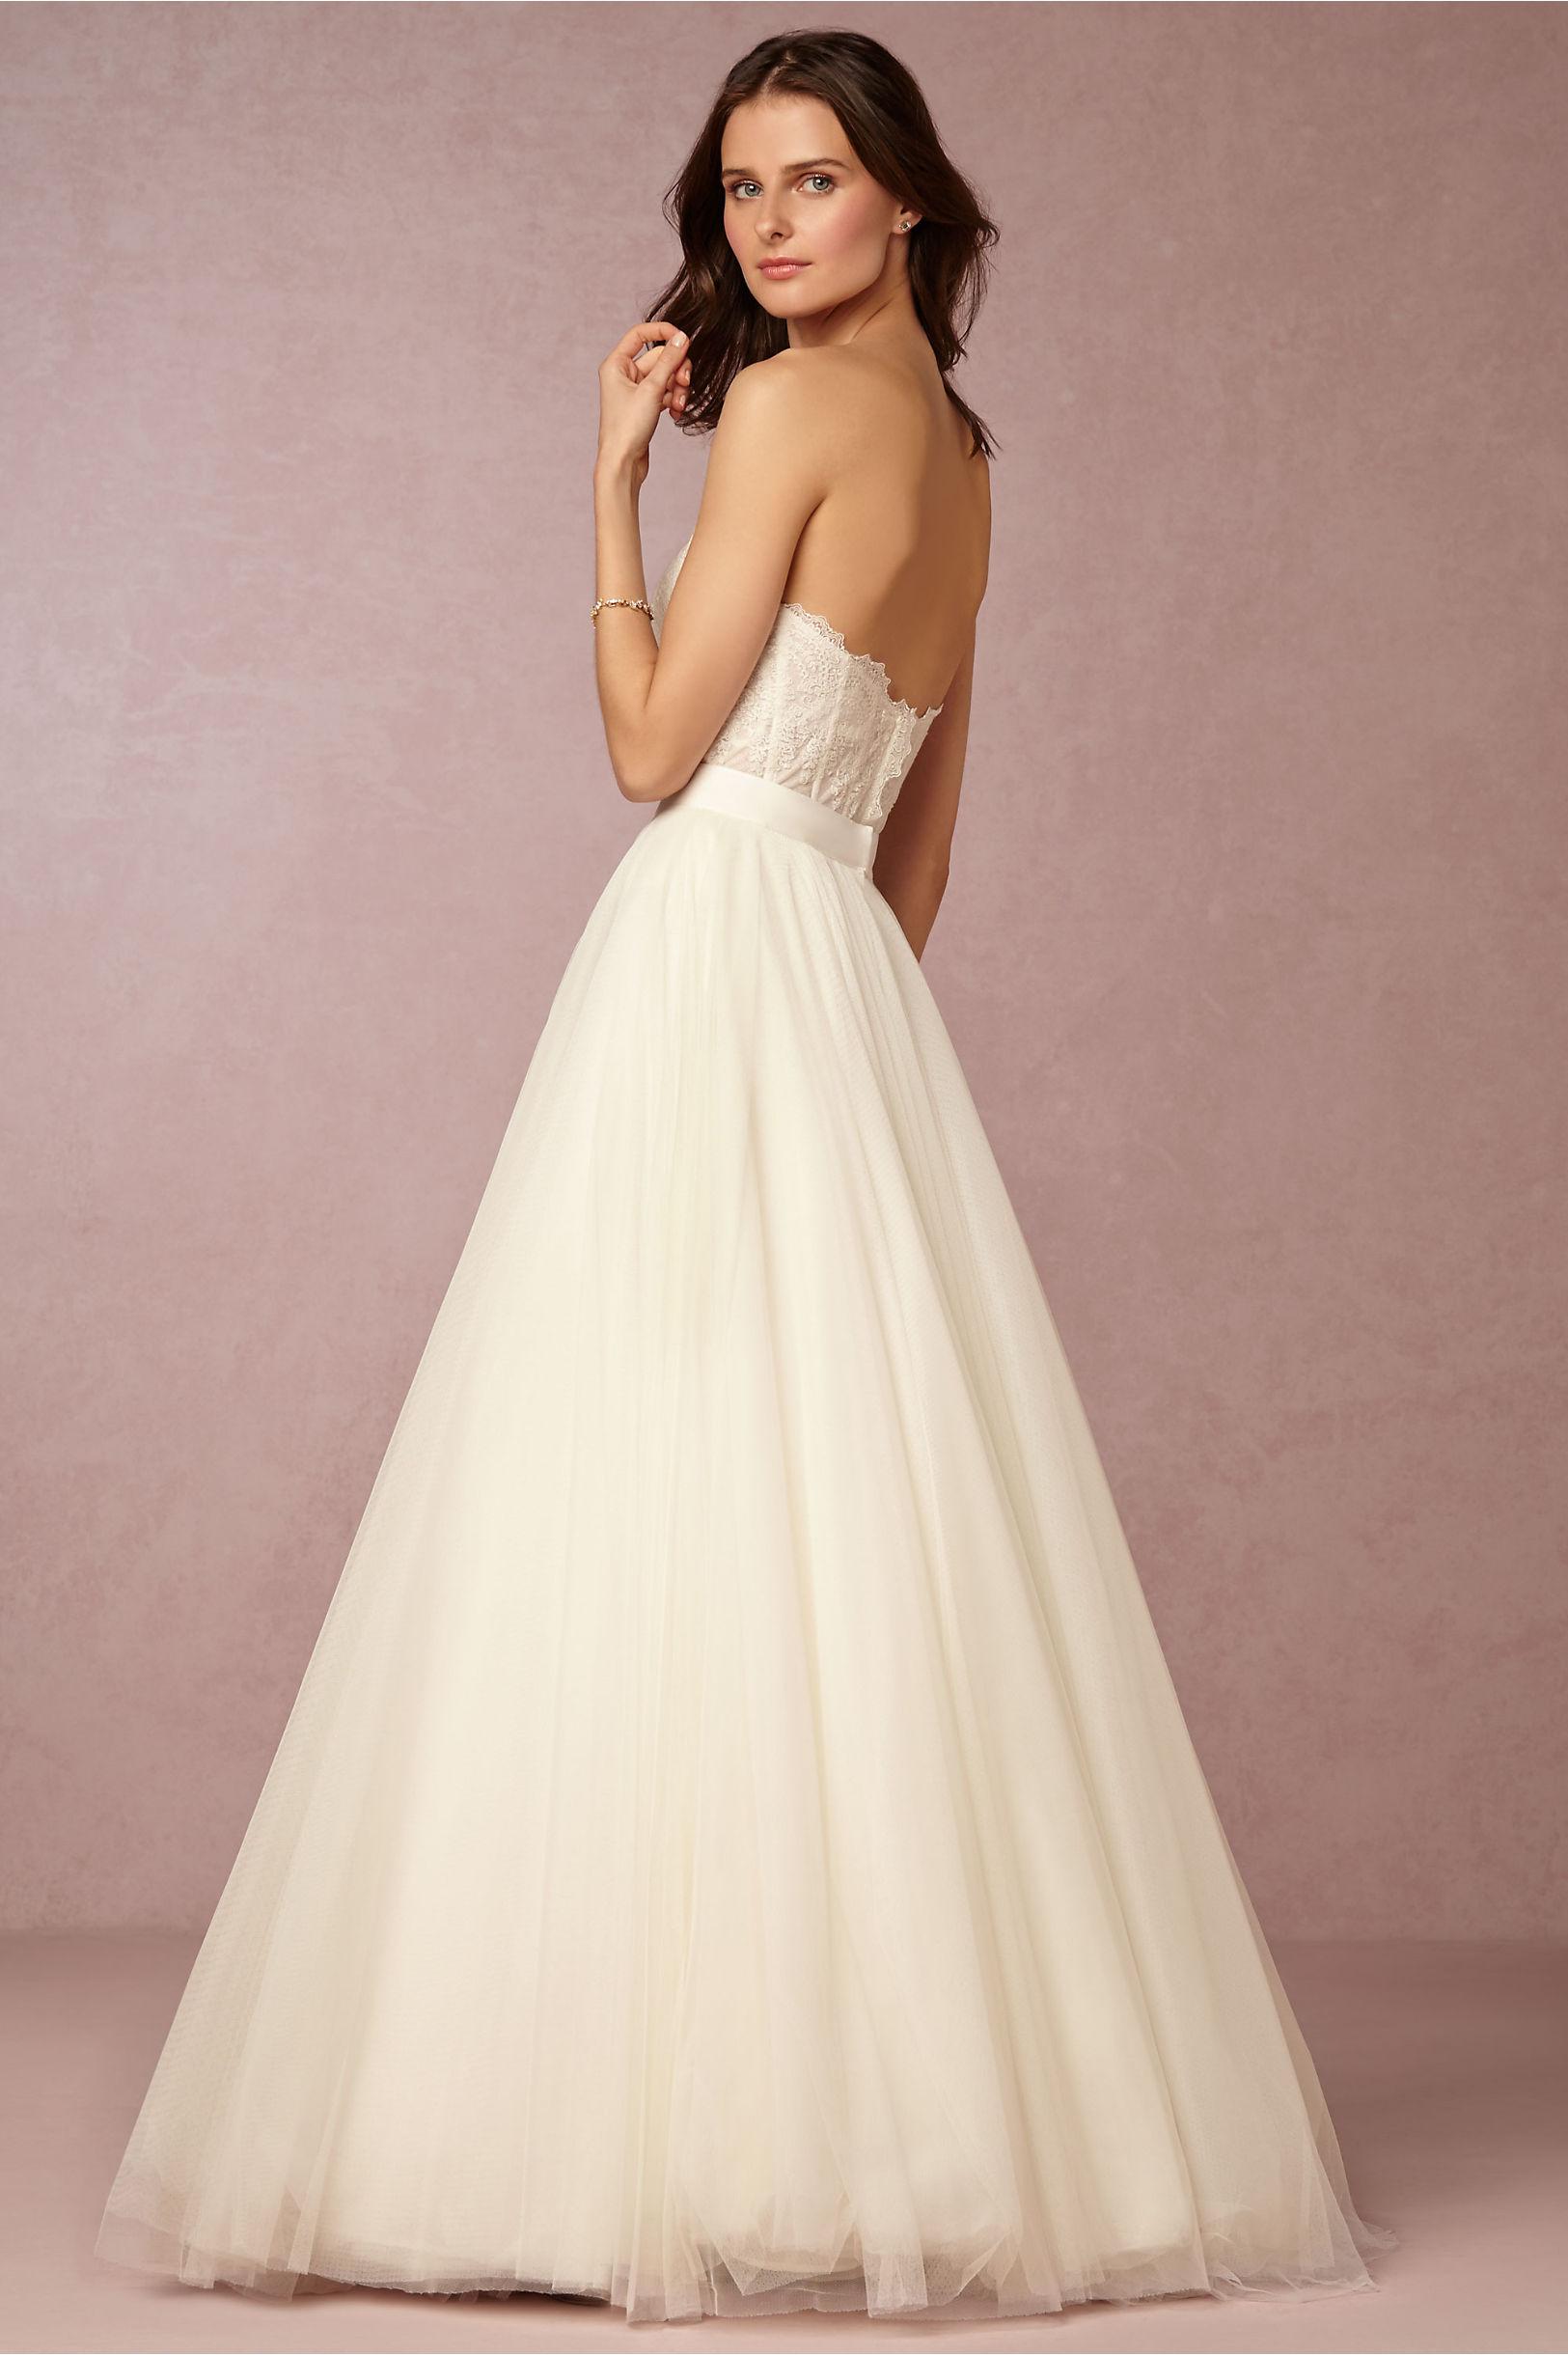 Carina Corset & Ahsan Skirt in Bride   BHLDN